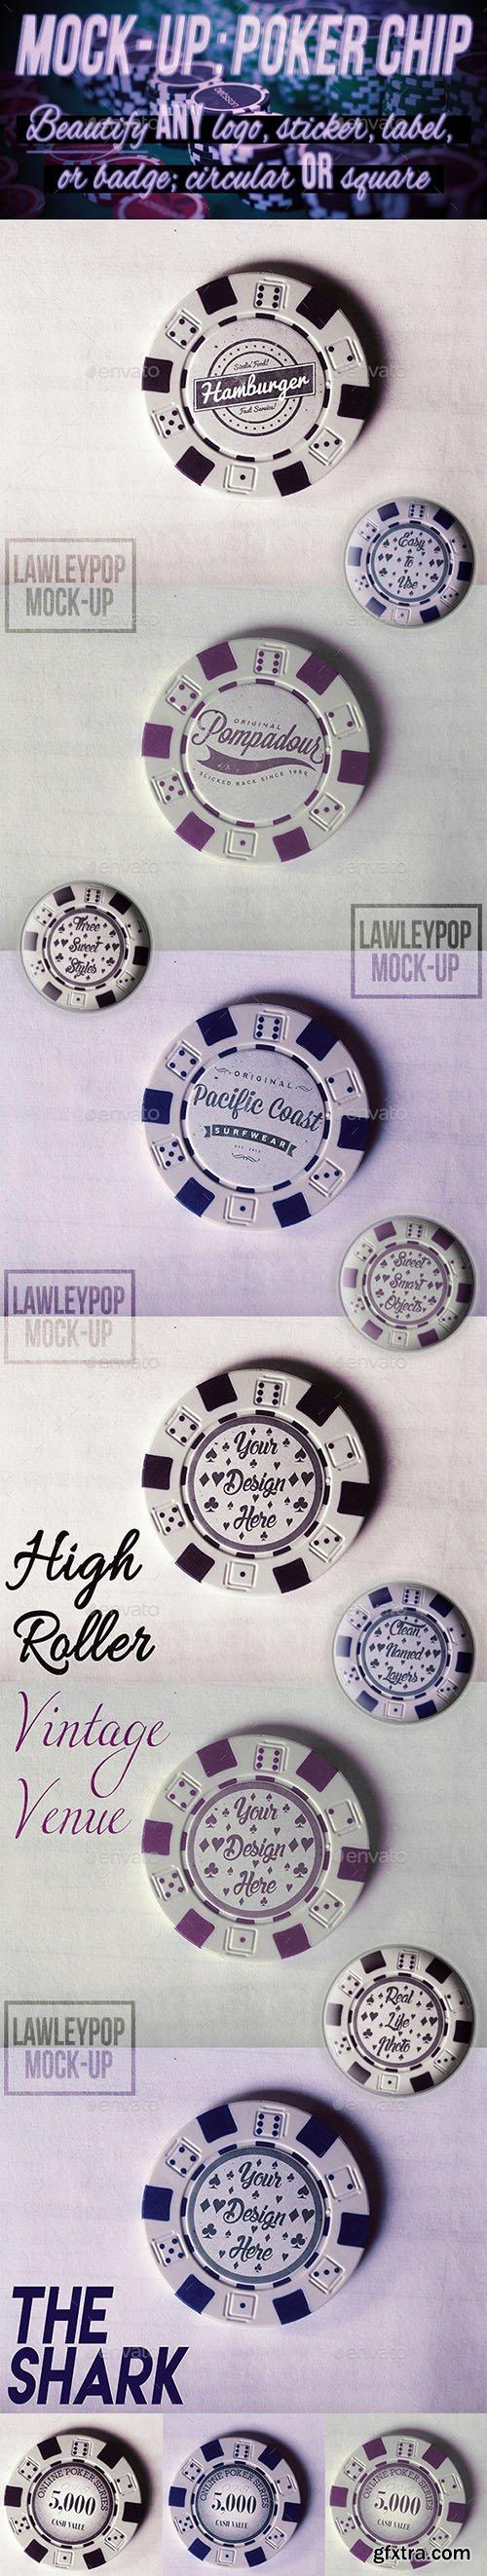 GraphicRiver Poker Chip Mock-Up